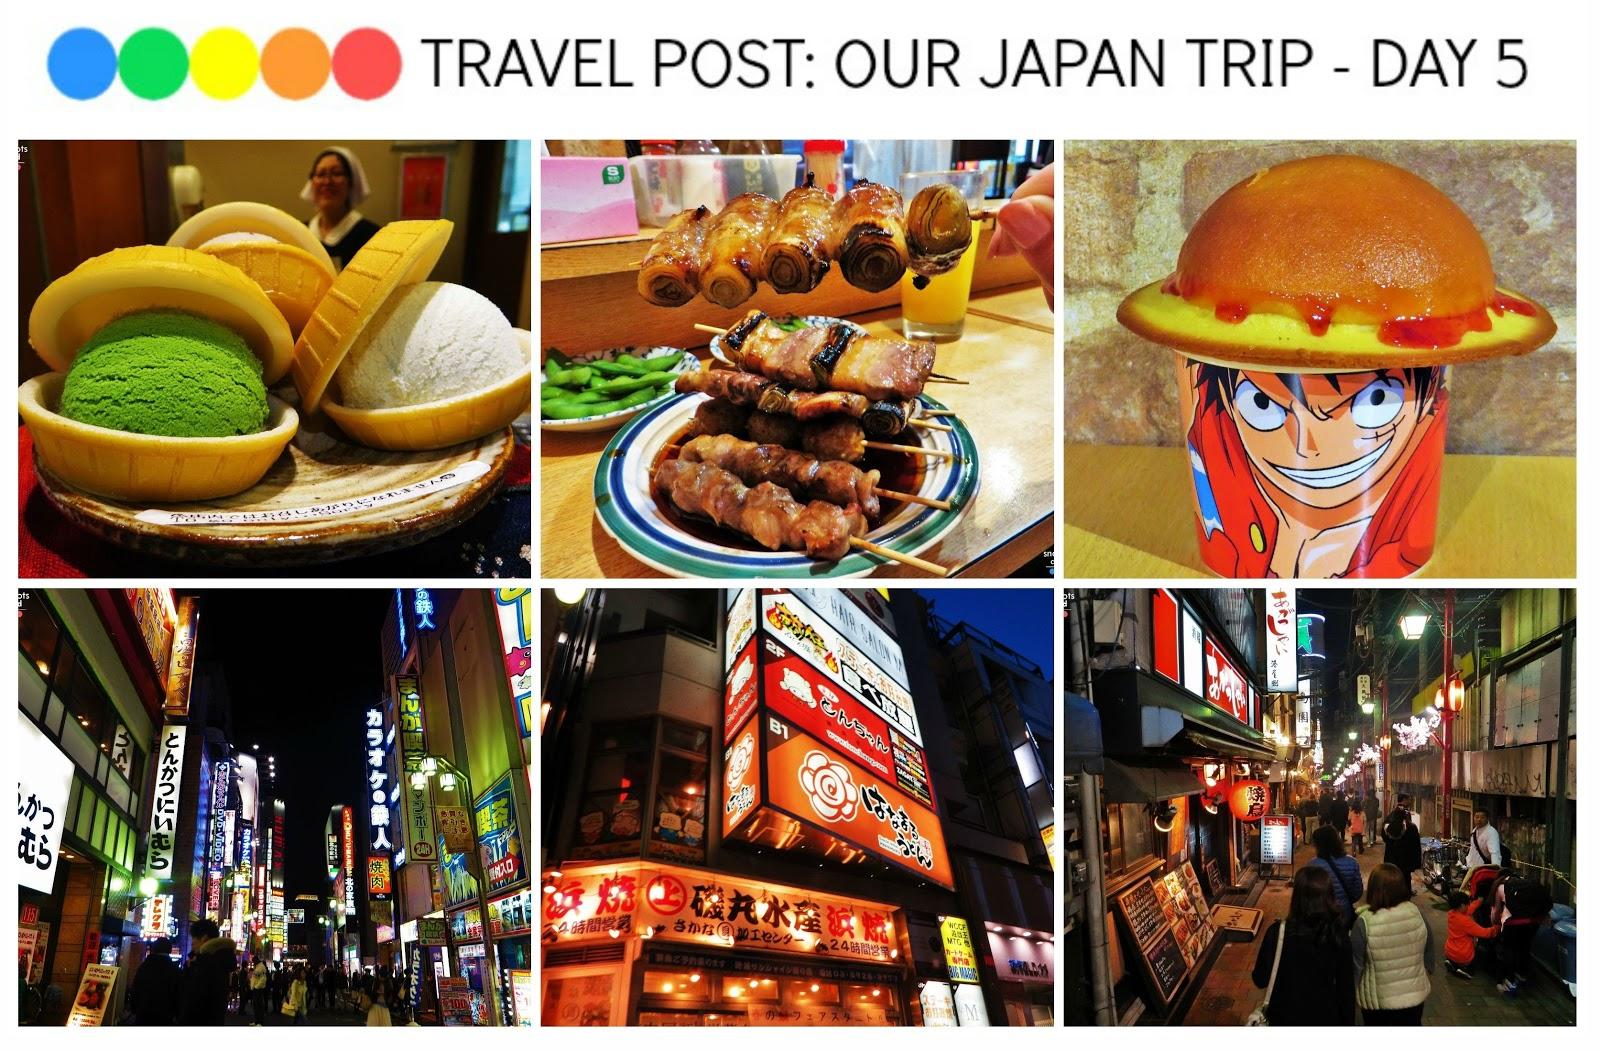 Travel Post: Our Japan Trip - Day 5 (Shinjuku Gyeon National Garden, Sunshine City, J-World, Pokemon Centre, Piss Alley aka Omoide Yokocho)